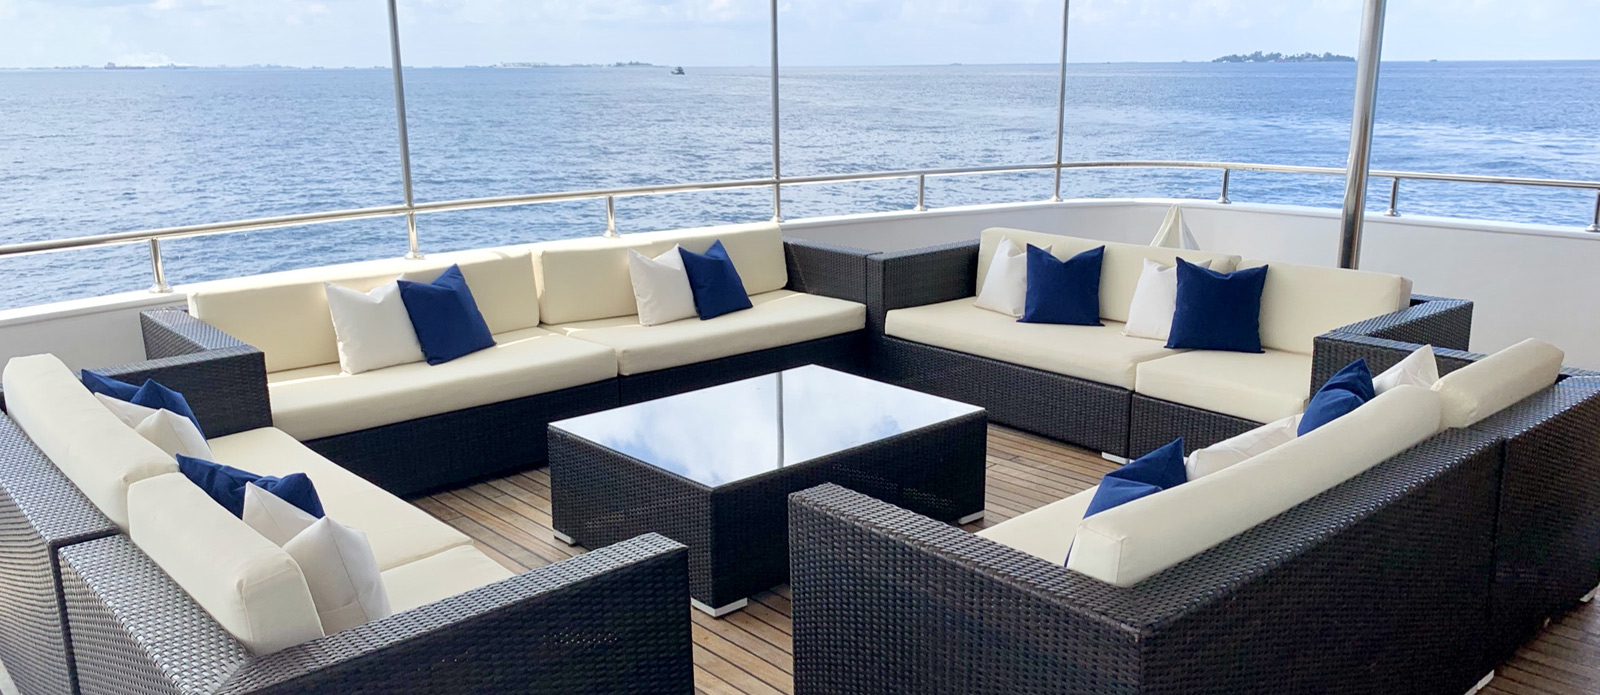 Safira-Luxury-Yacht-For-Sale-Interior-17